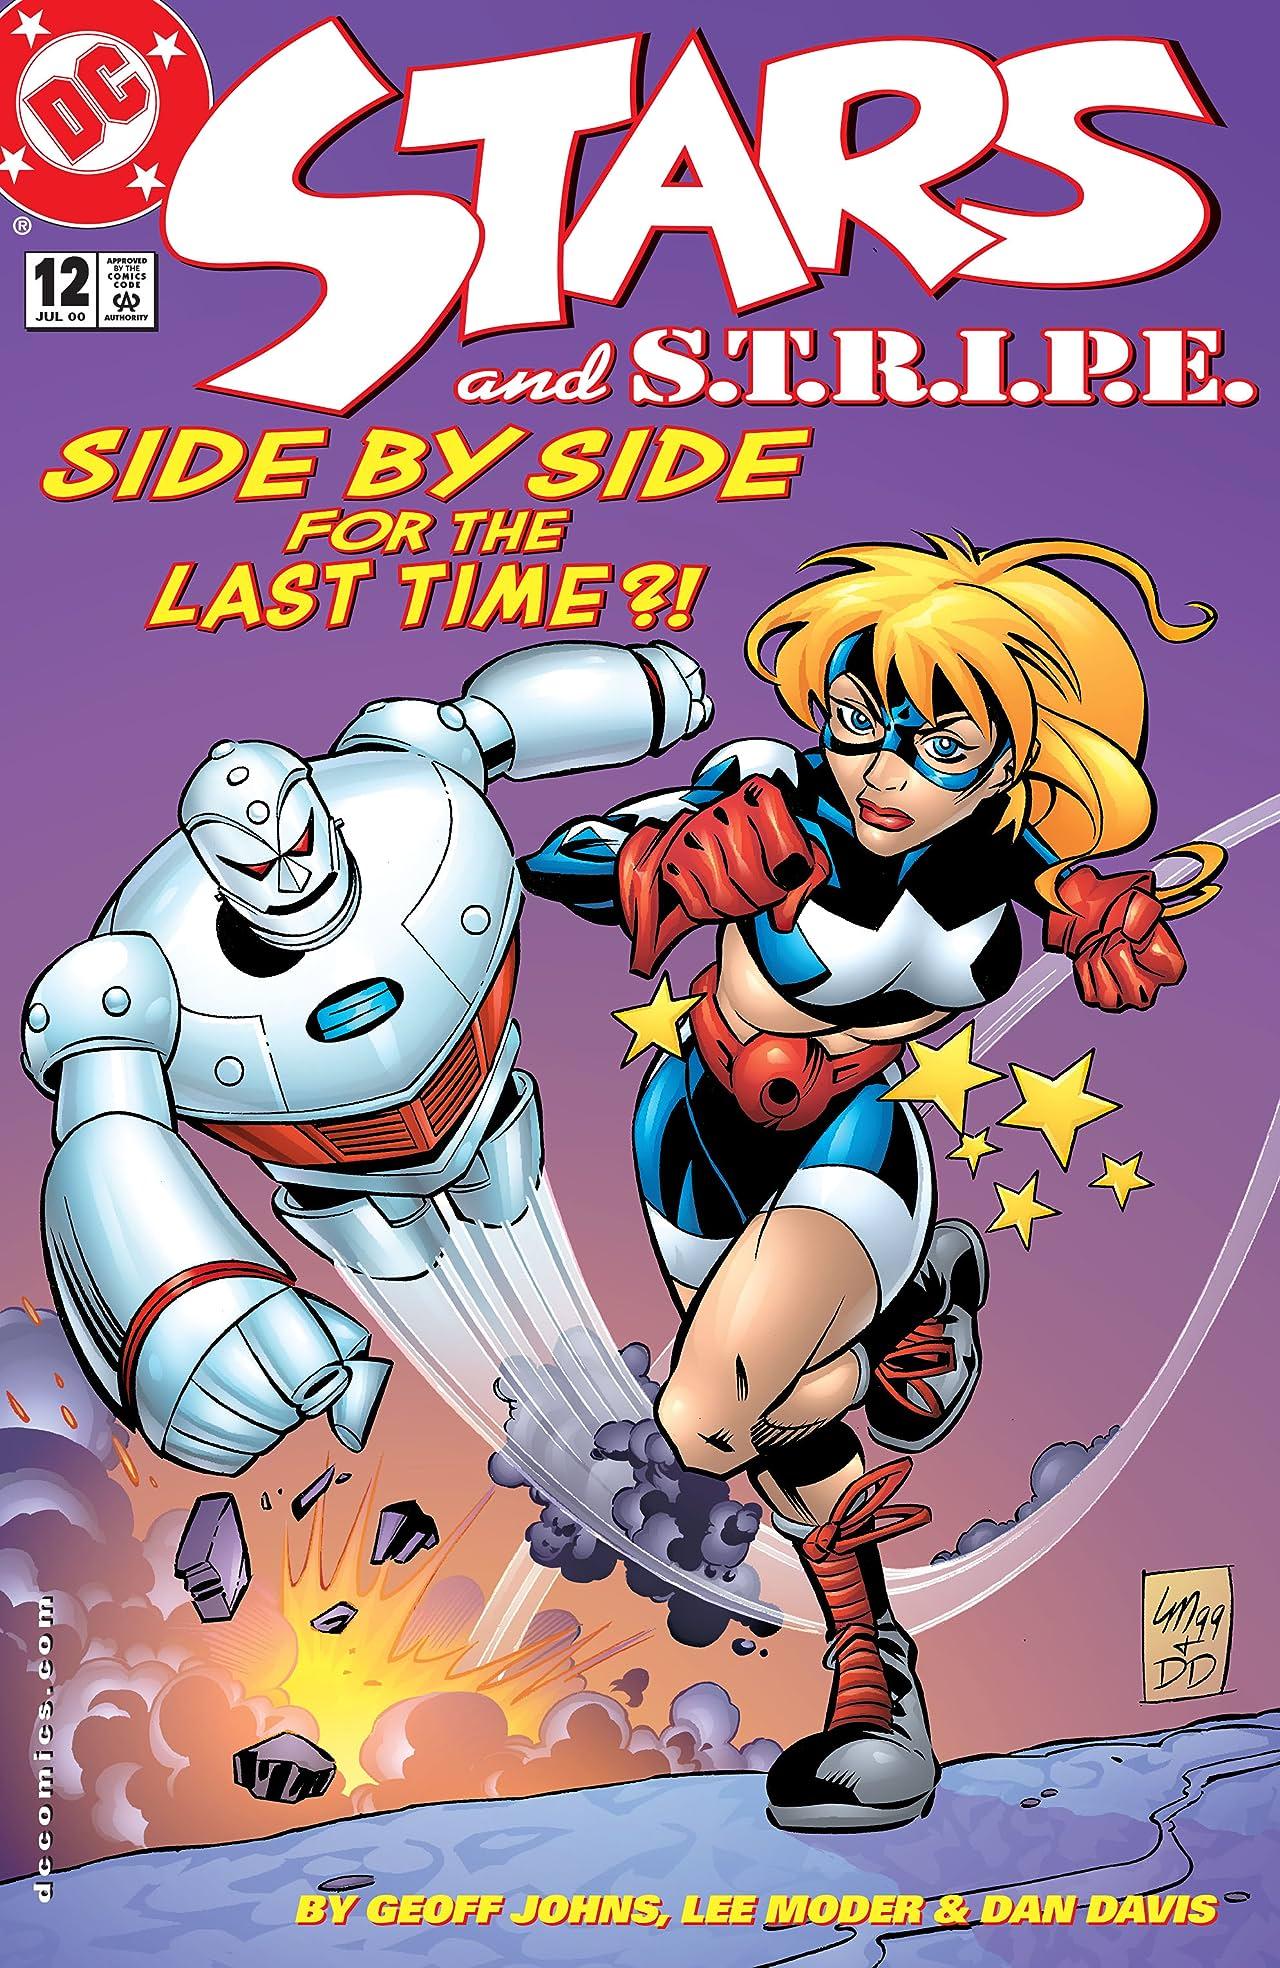 Stars and S.T.R.I.P.E. (1999-2000) #12